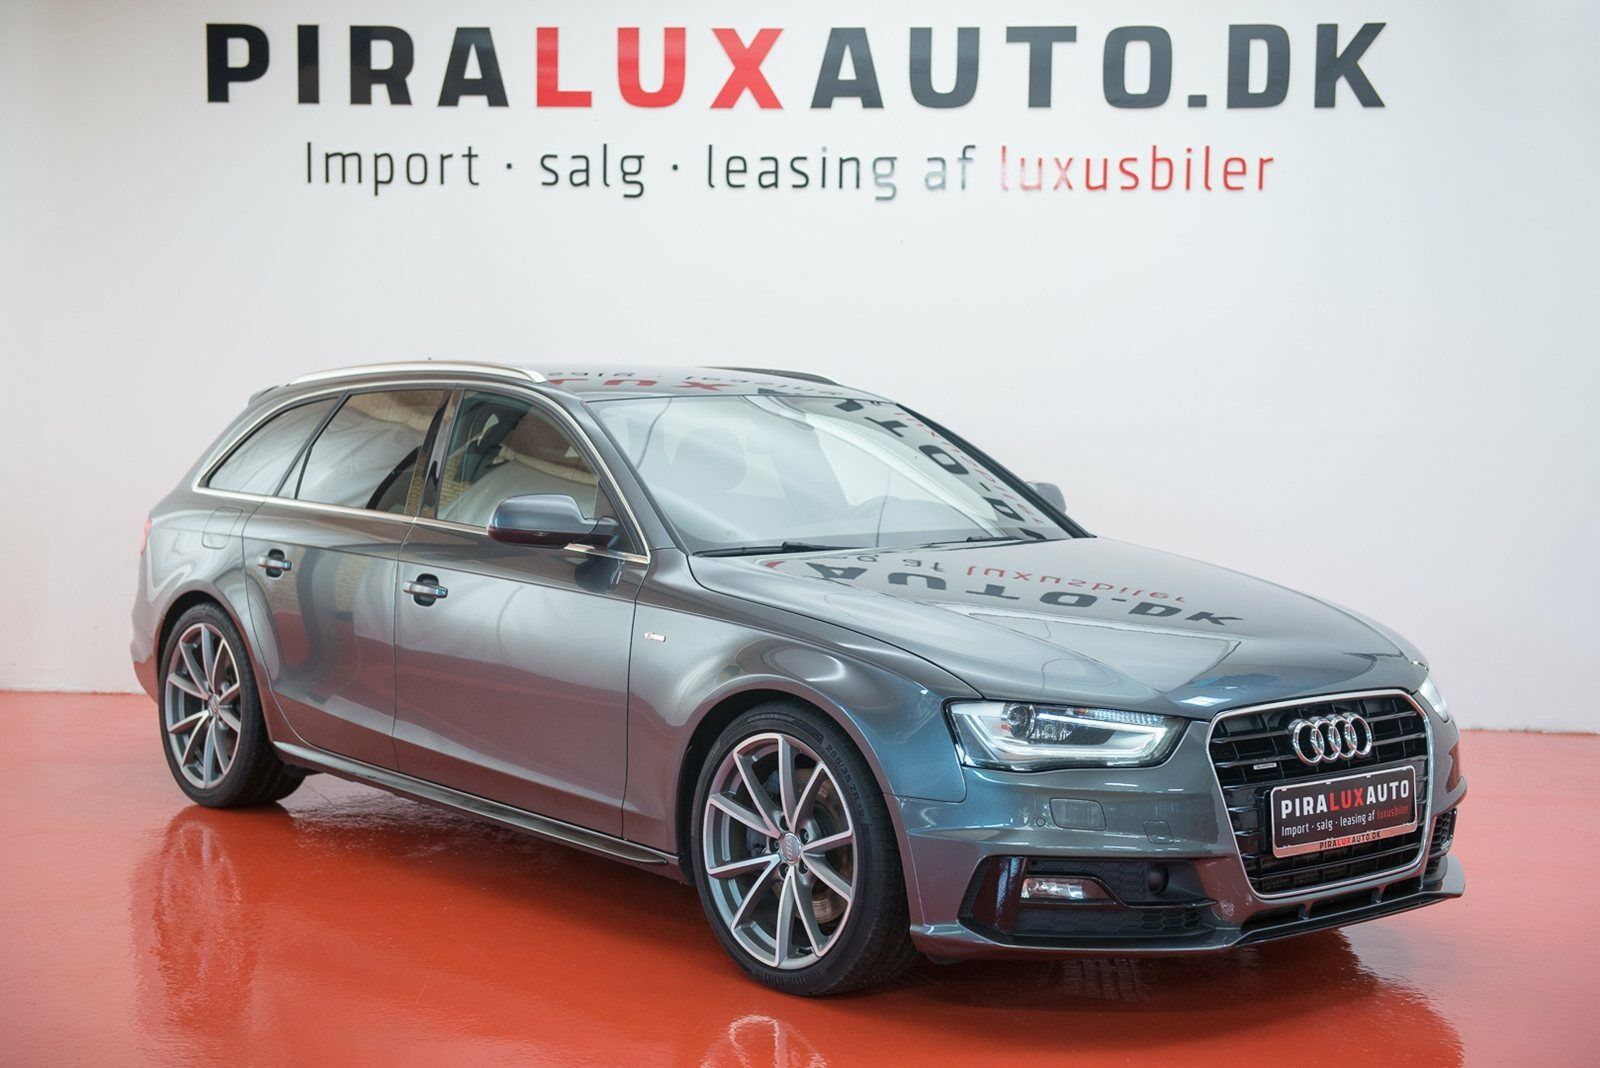 Audi A4 3,0 TDi 245 S-line Avant quat S-tr 5d - 379.900 kr.